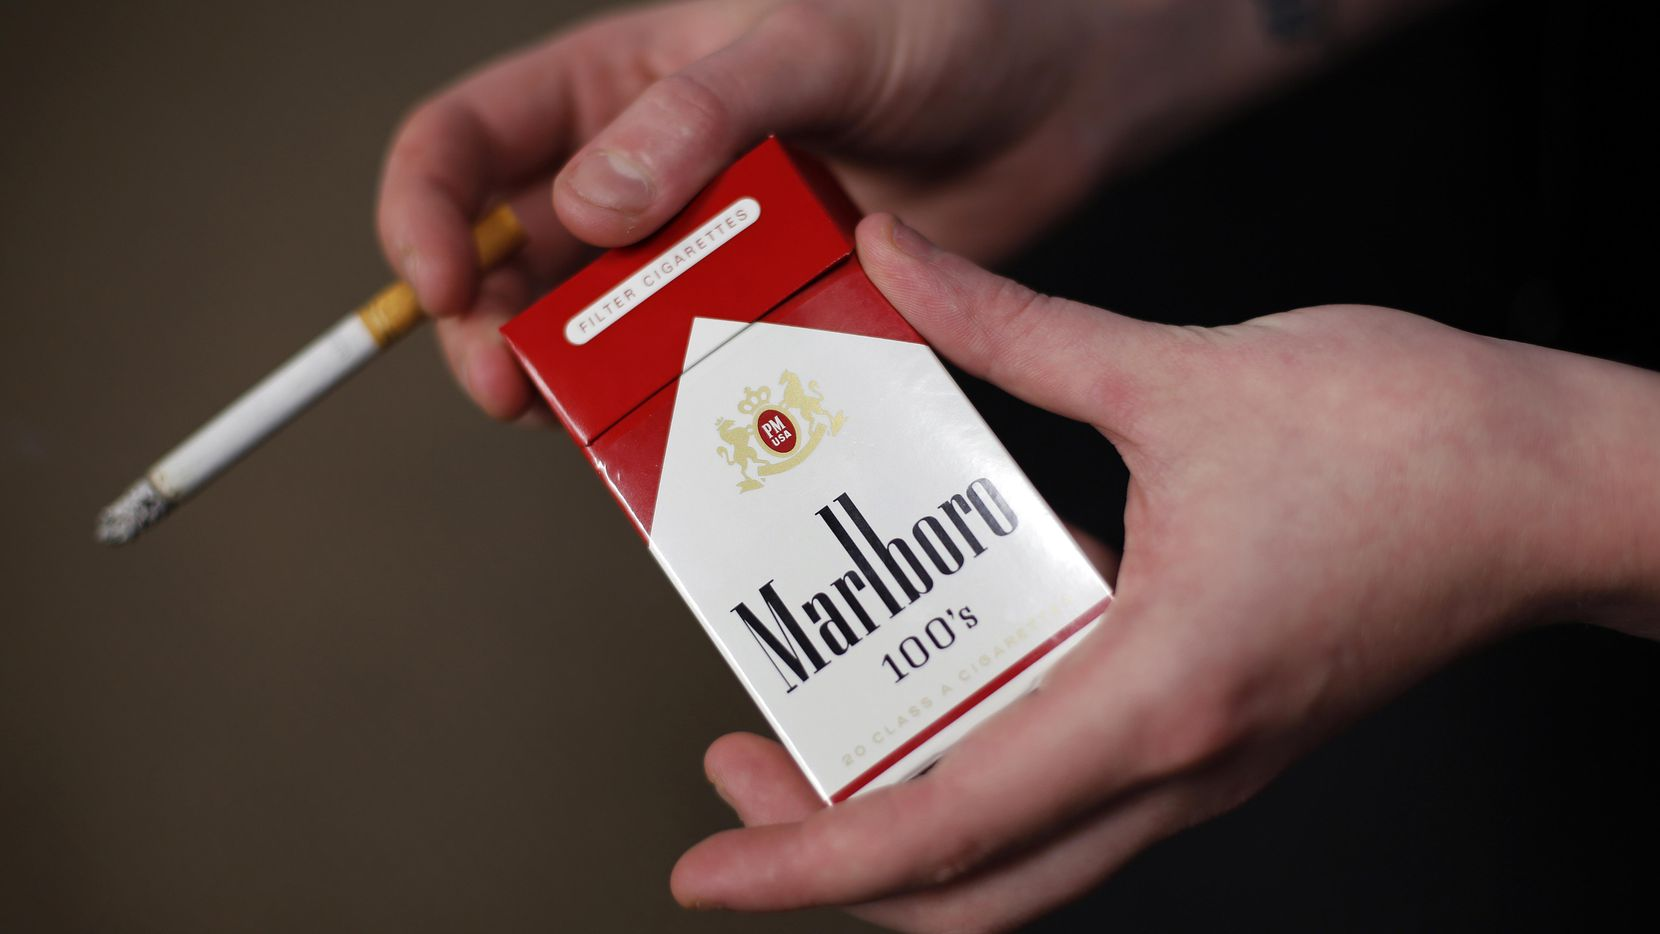 Una cajetilla de cigarros marlboros. (AP/Gene J. Puskar)